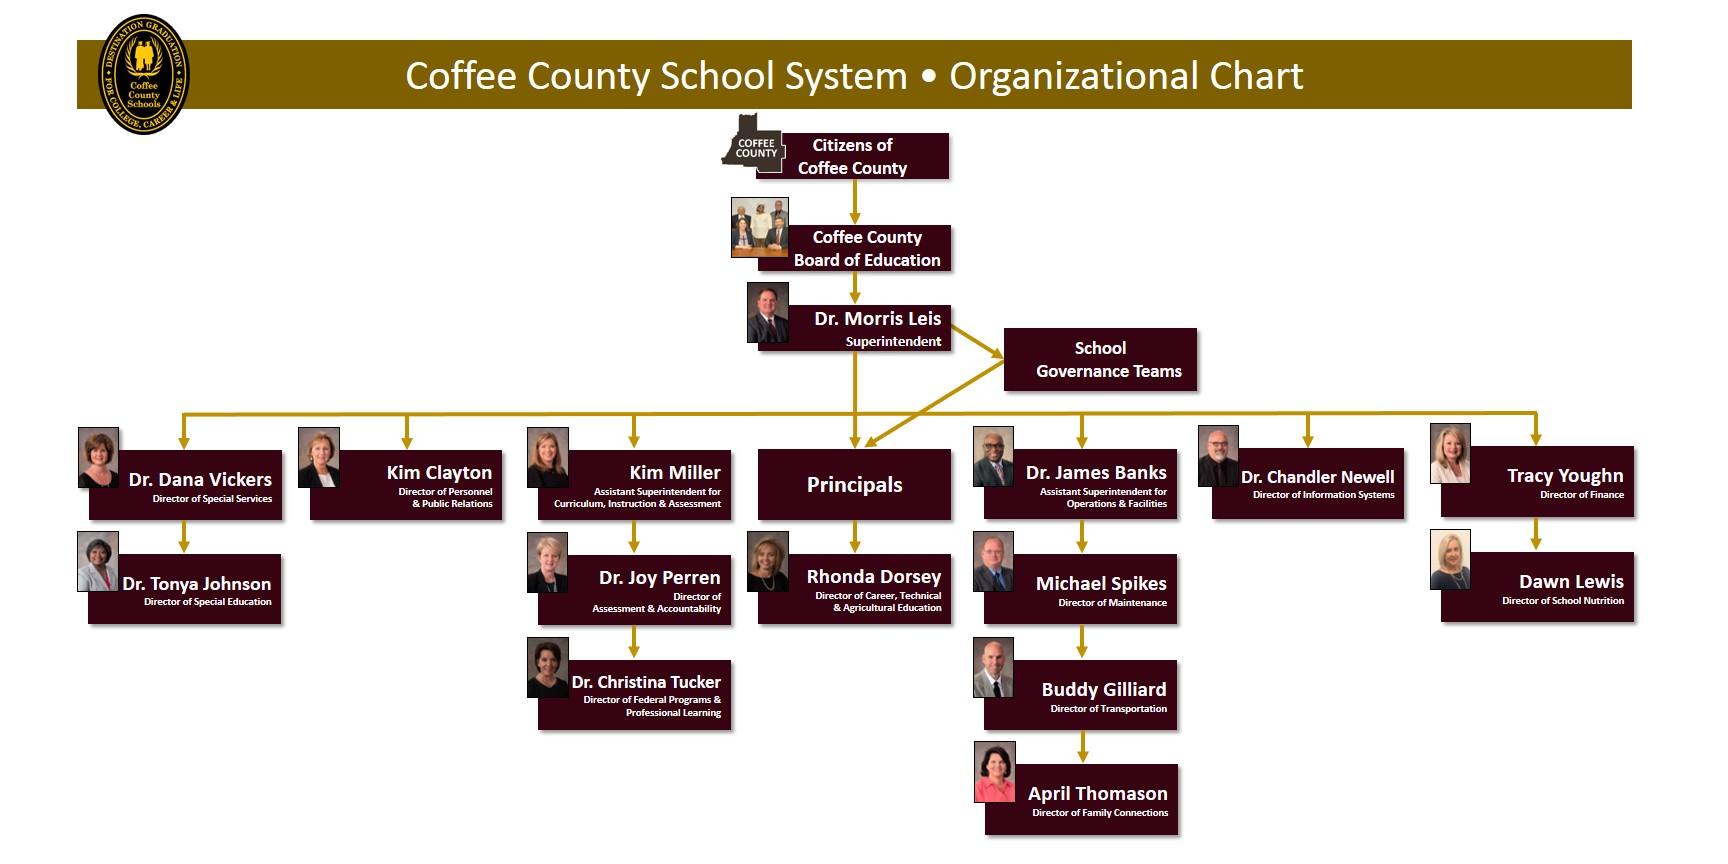 CCSS Organizational Chart